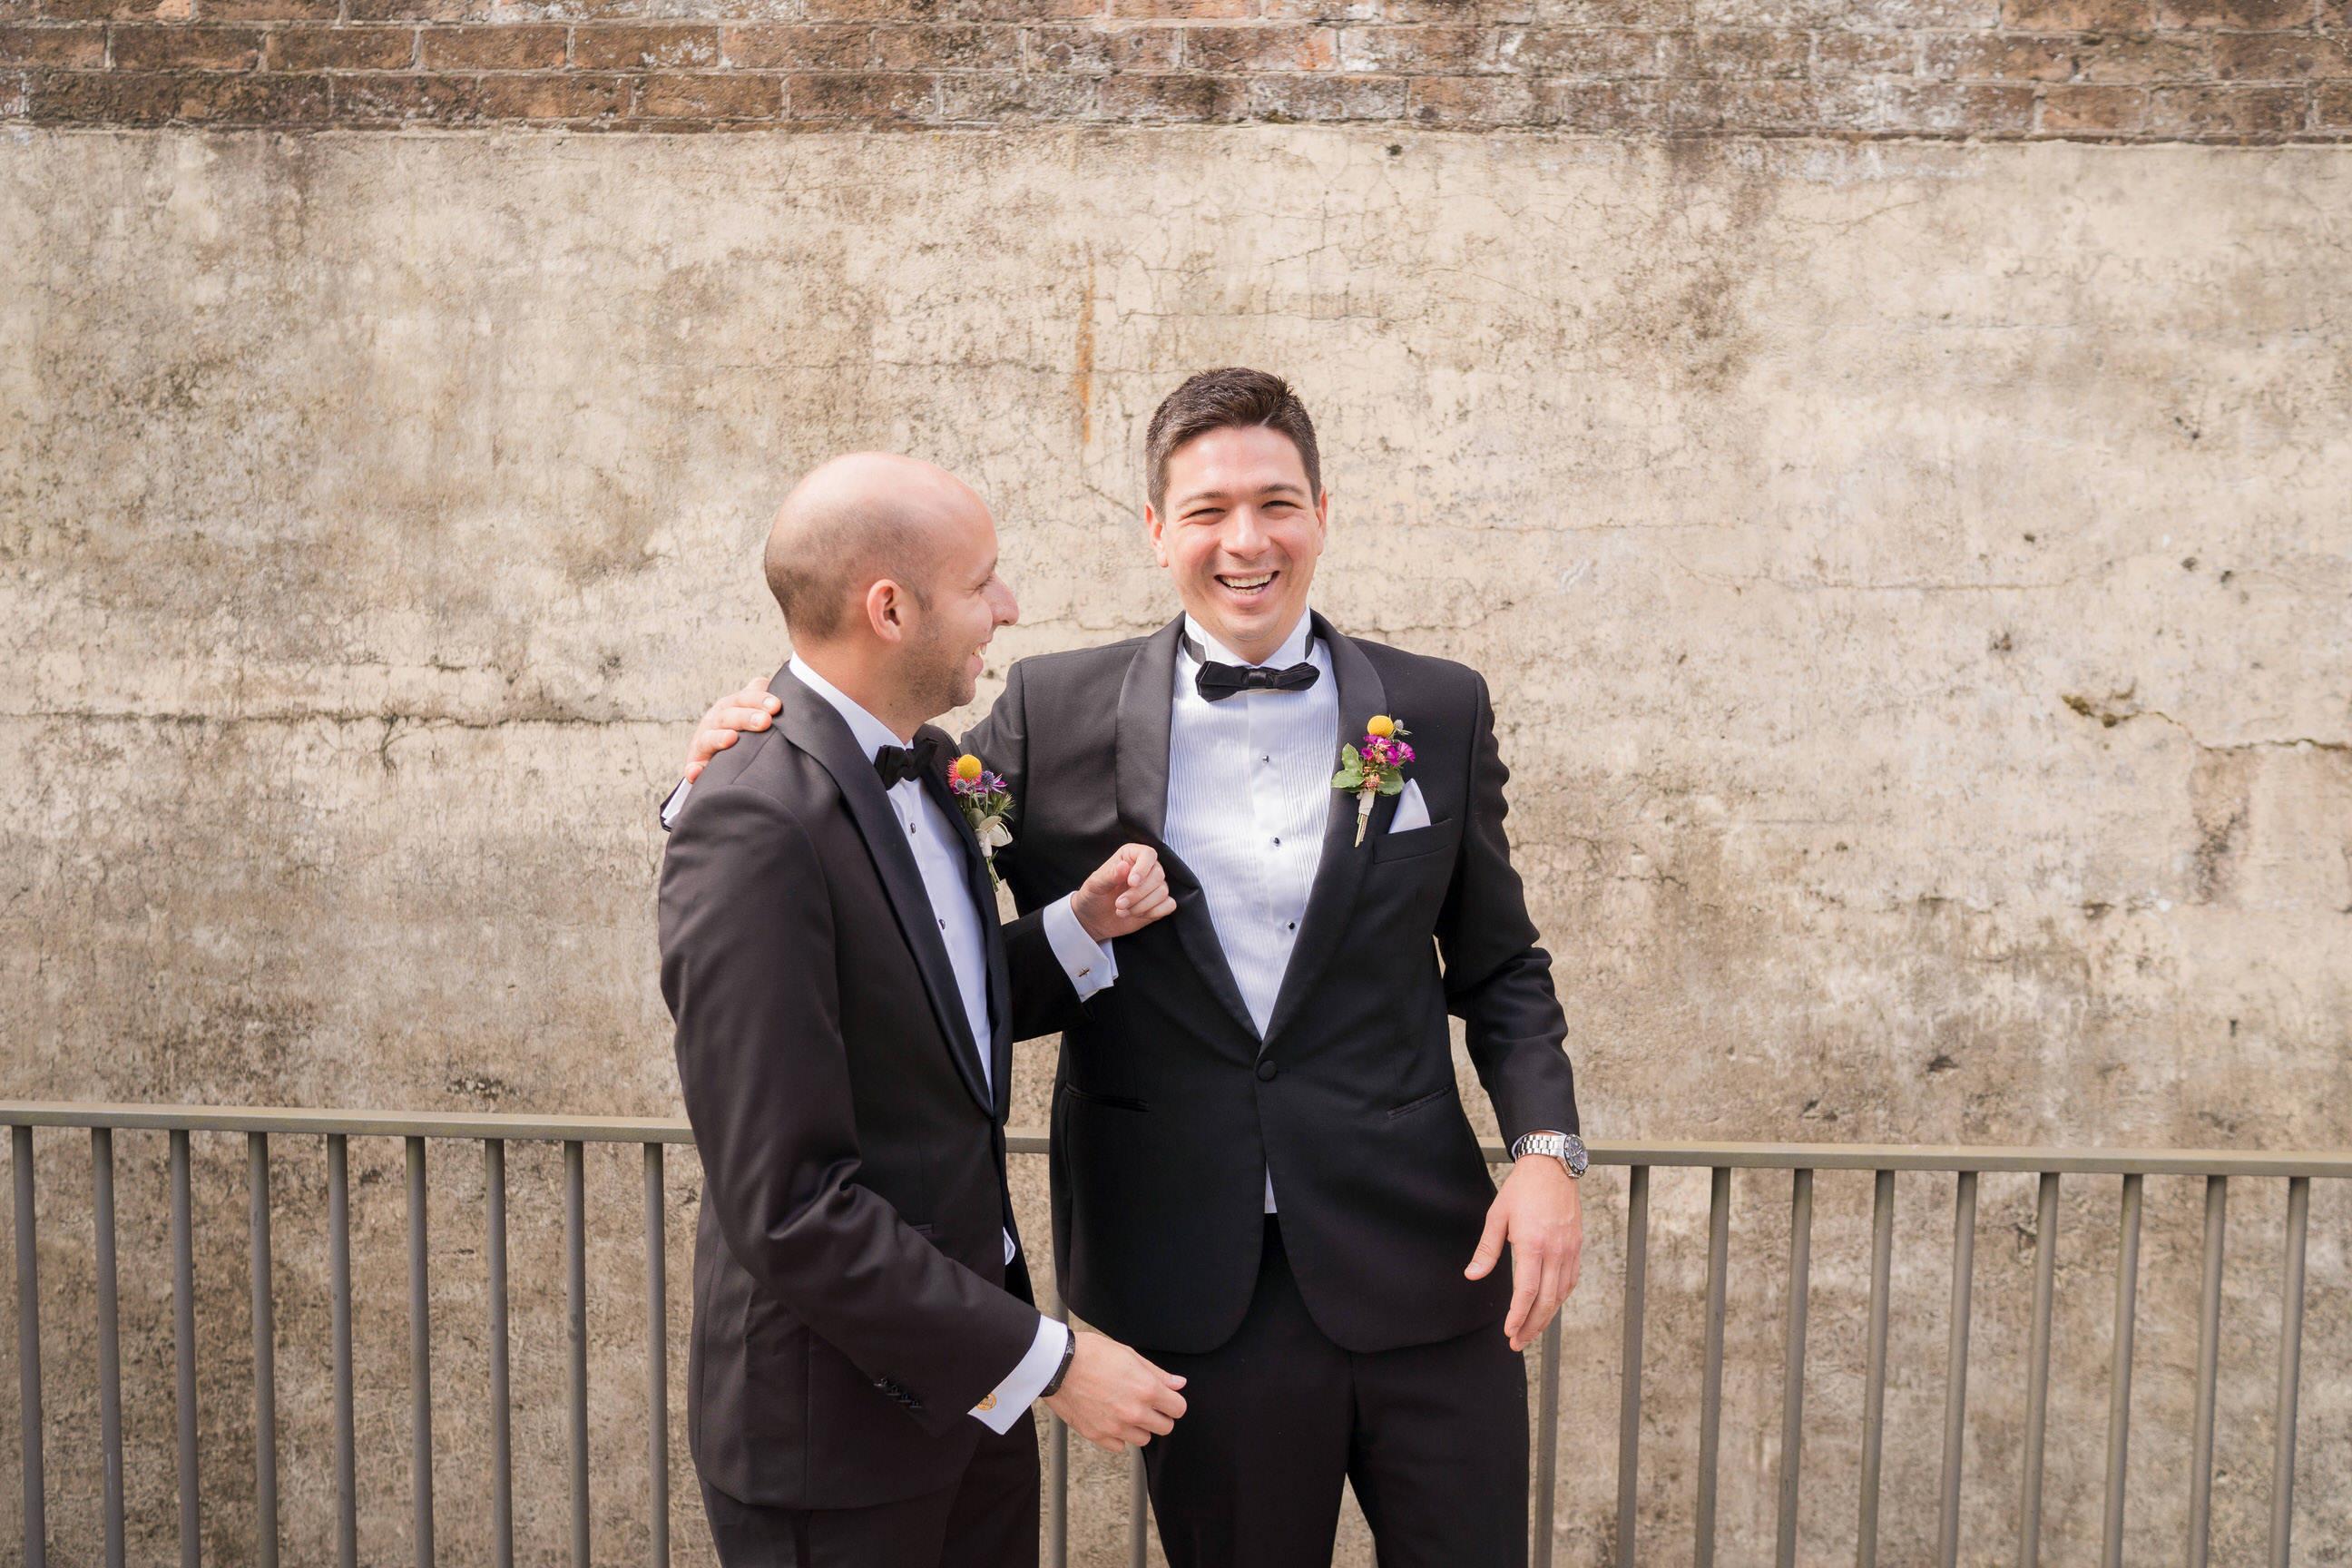 best man, usher, groom, groomswear, buttonholes, grooms suits,